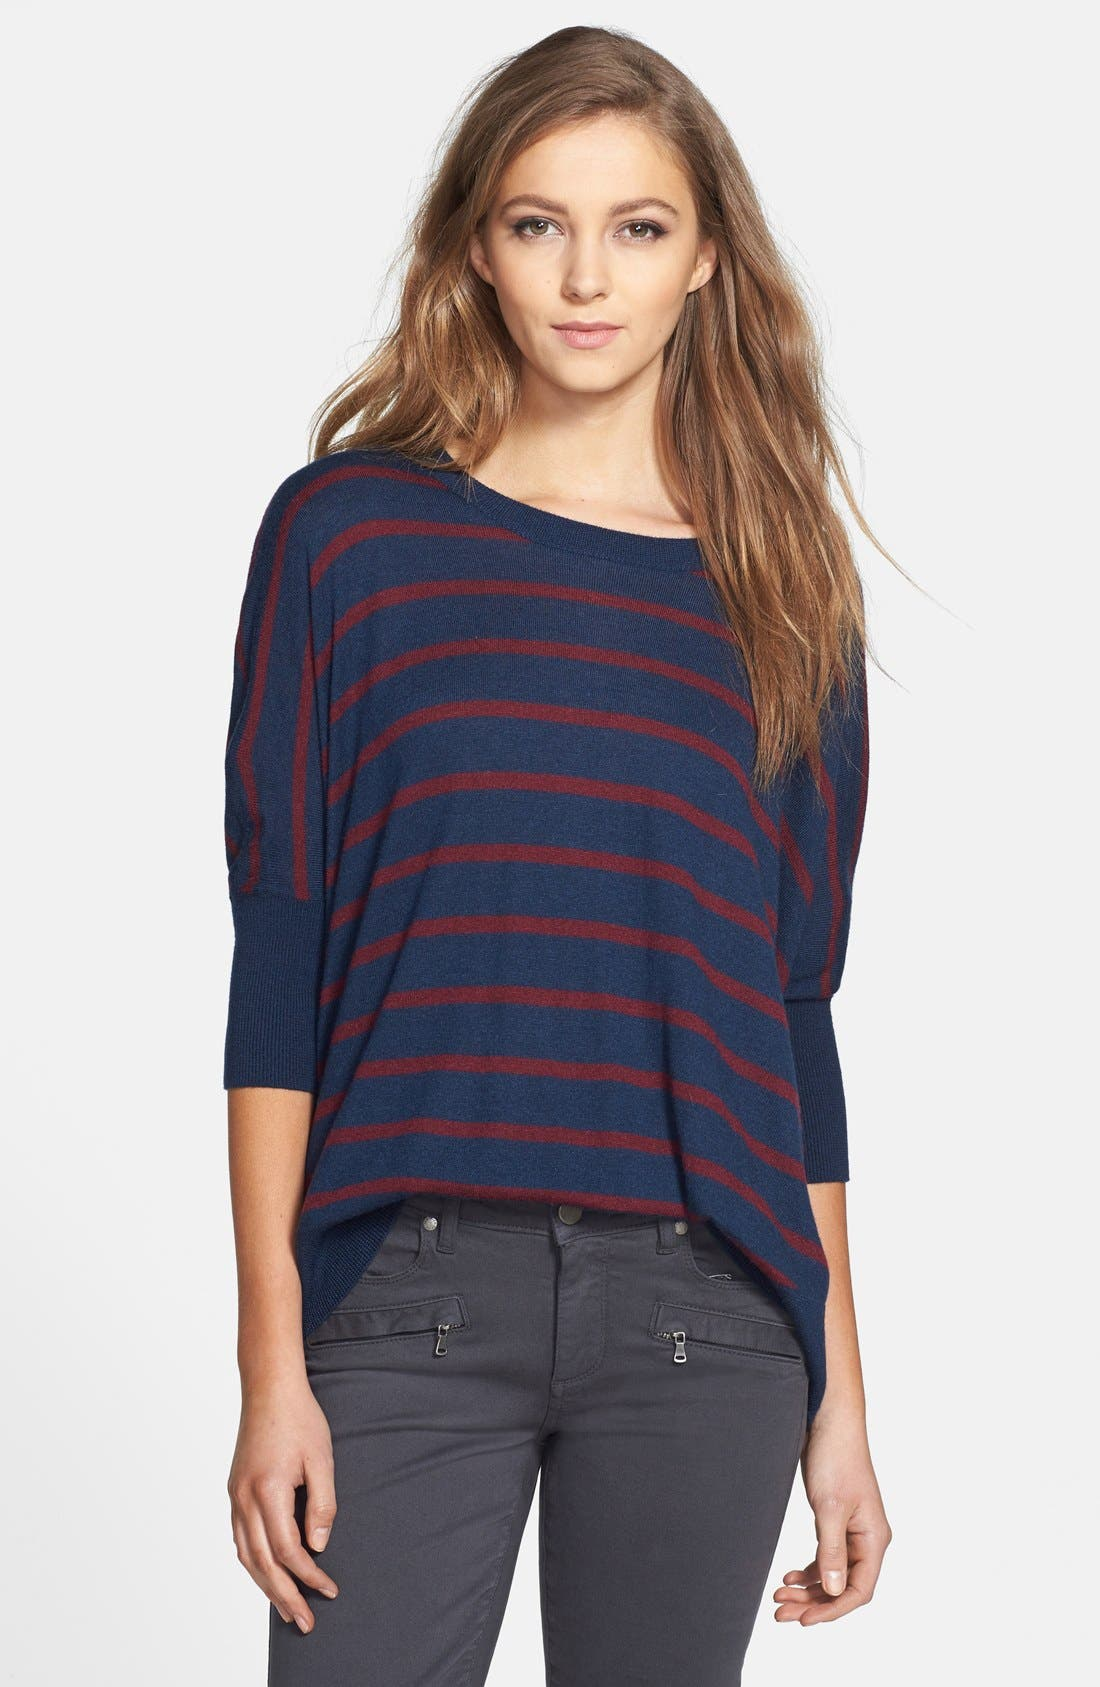 Alternate Image 1 Selected - Splendid 'Upton' Space Dye Stripe Sweater (Nordstrom Exclusive)